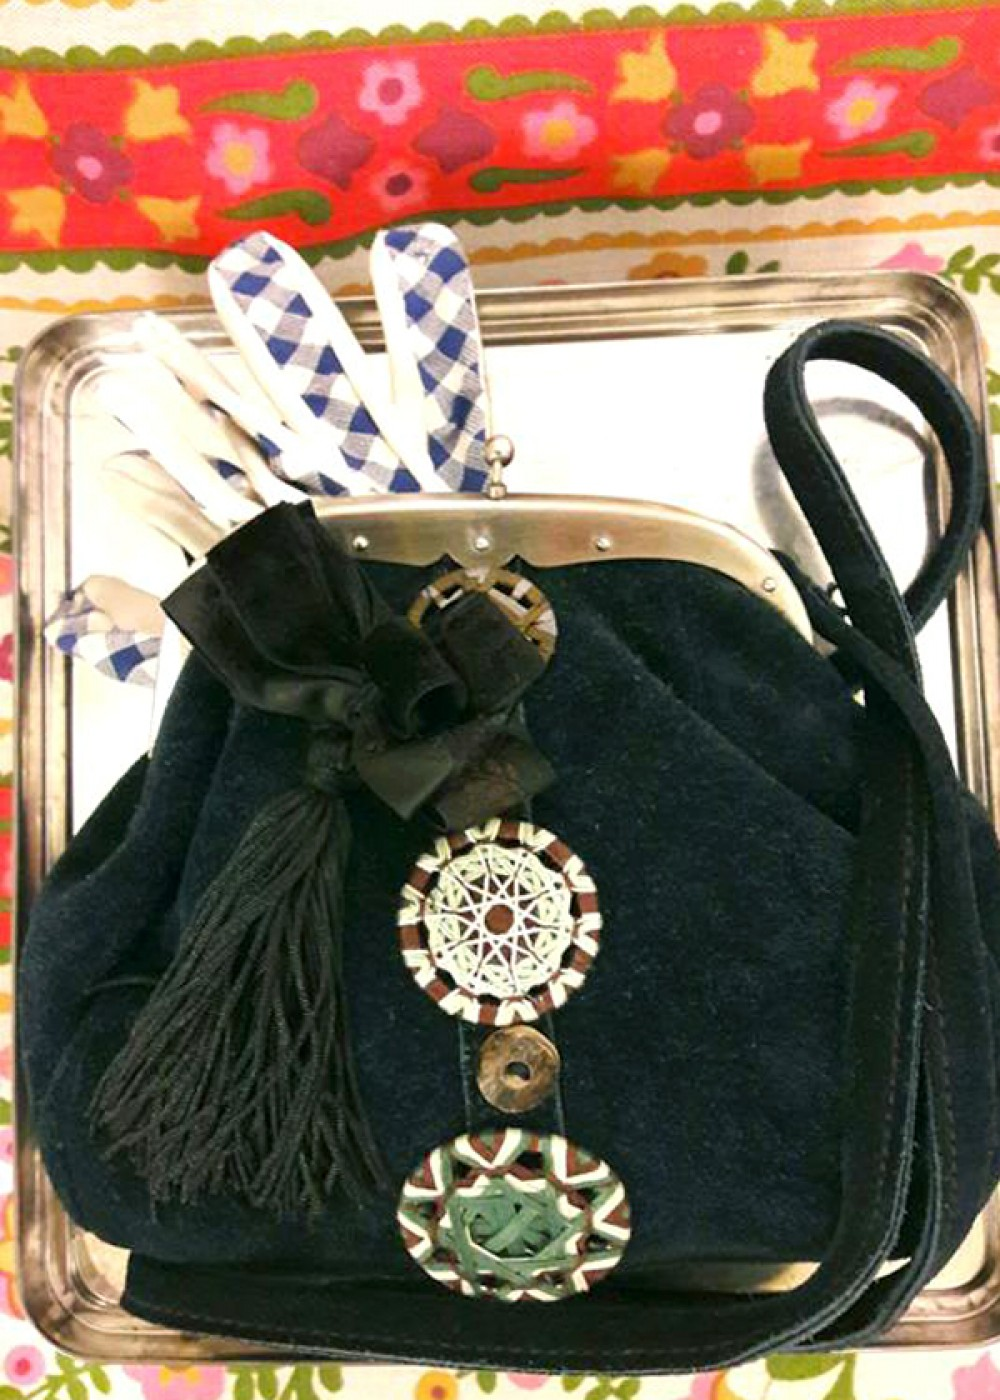 baunkelige Trachtentasche